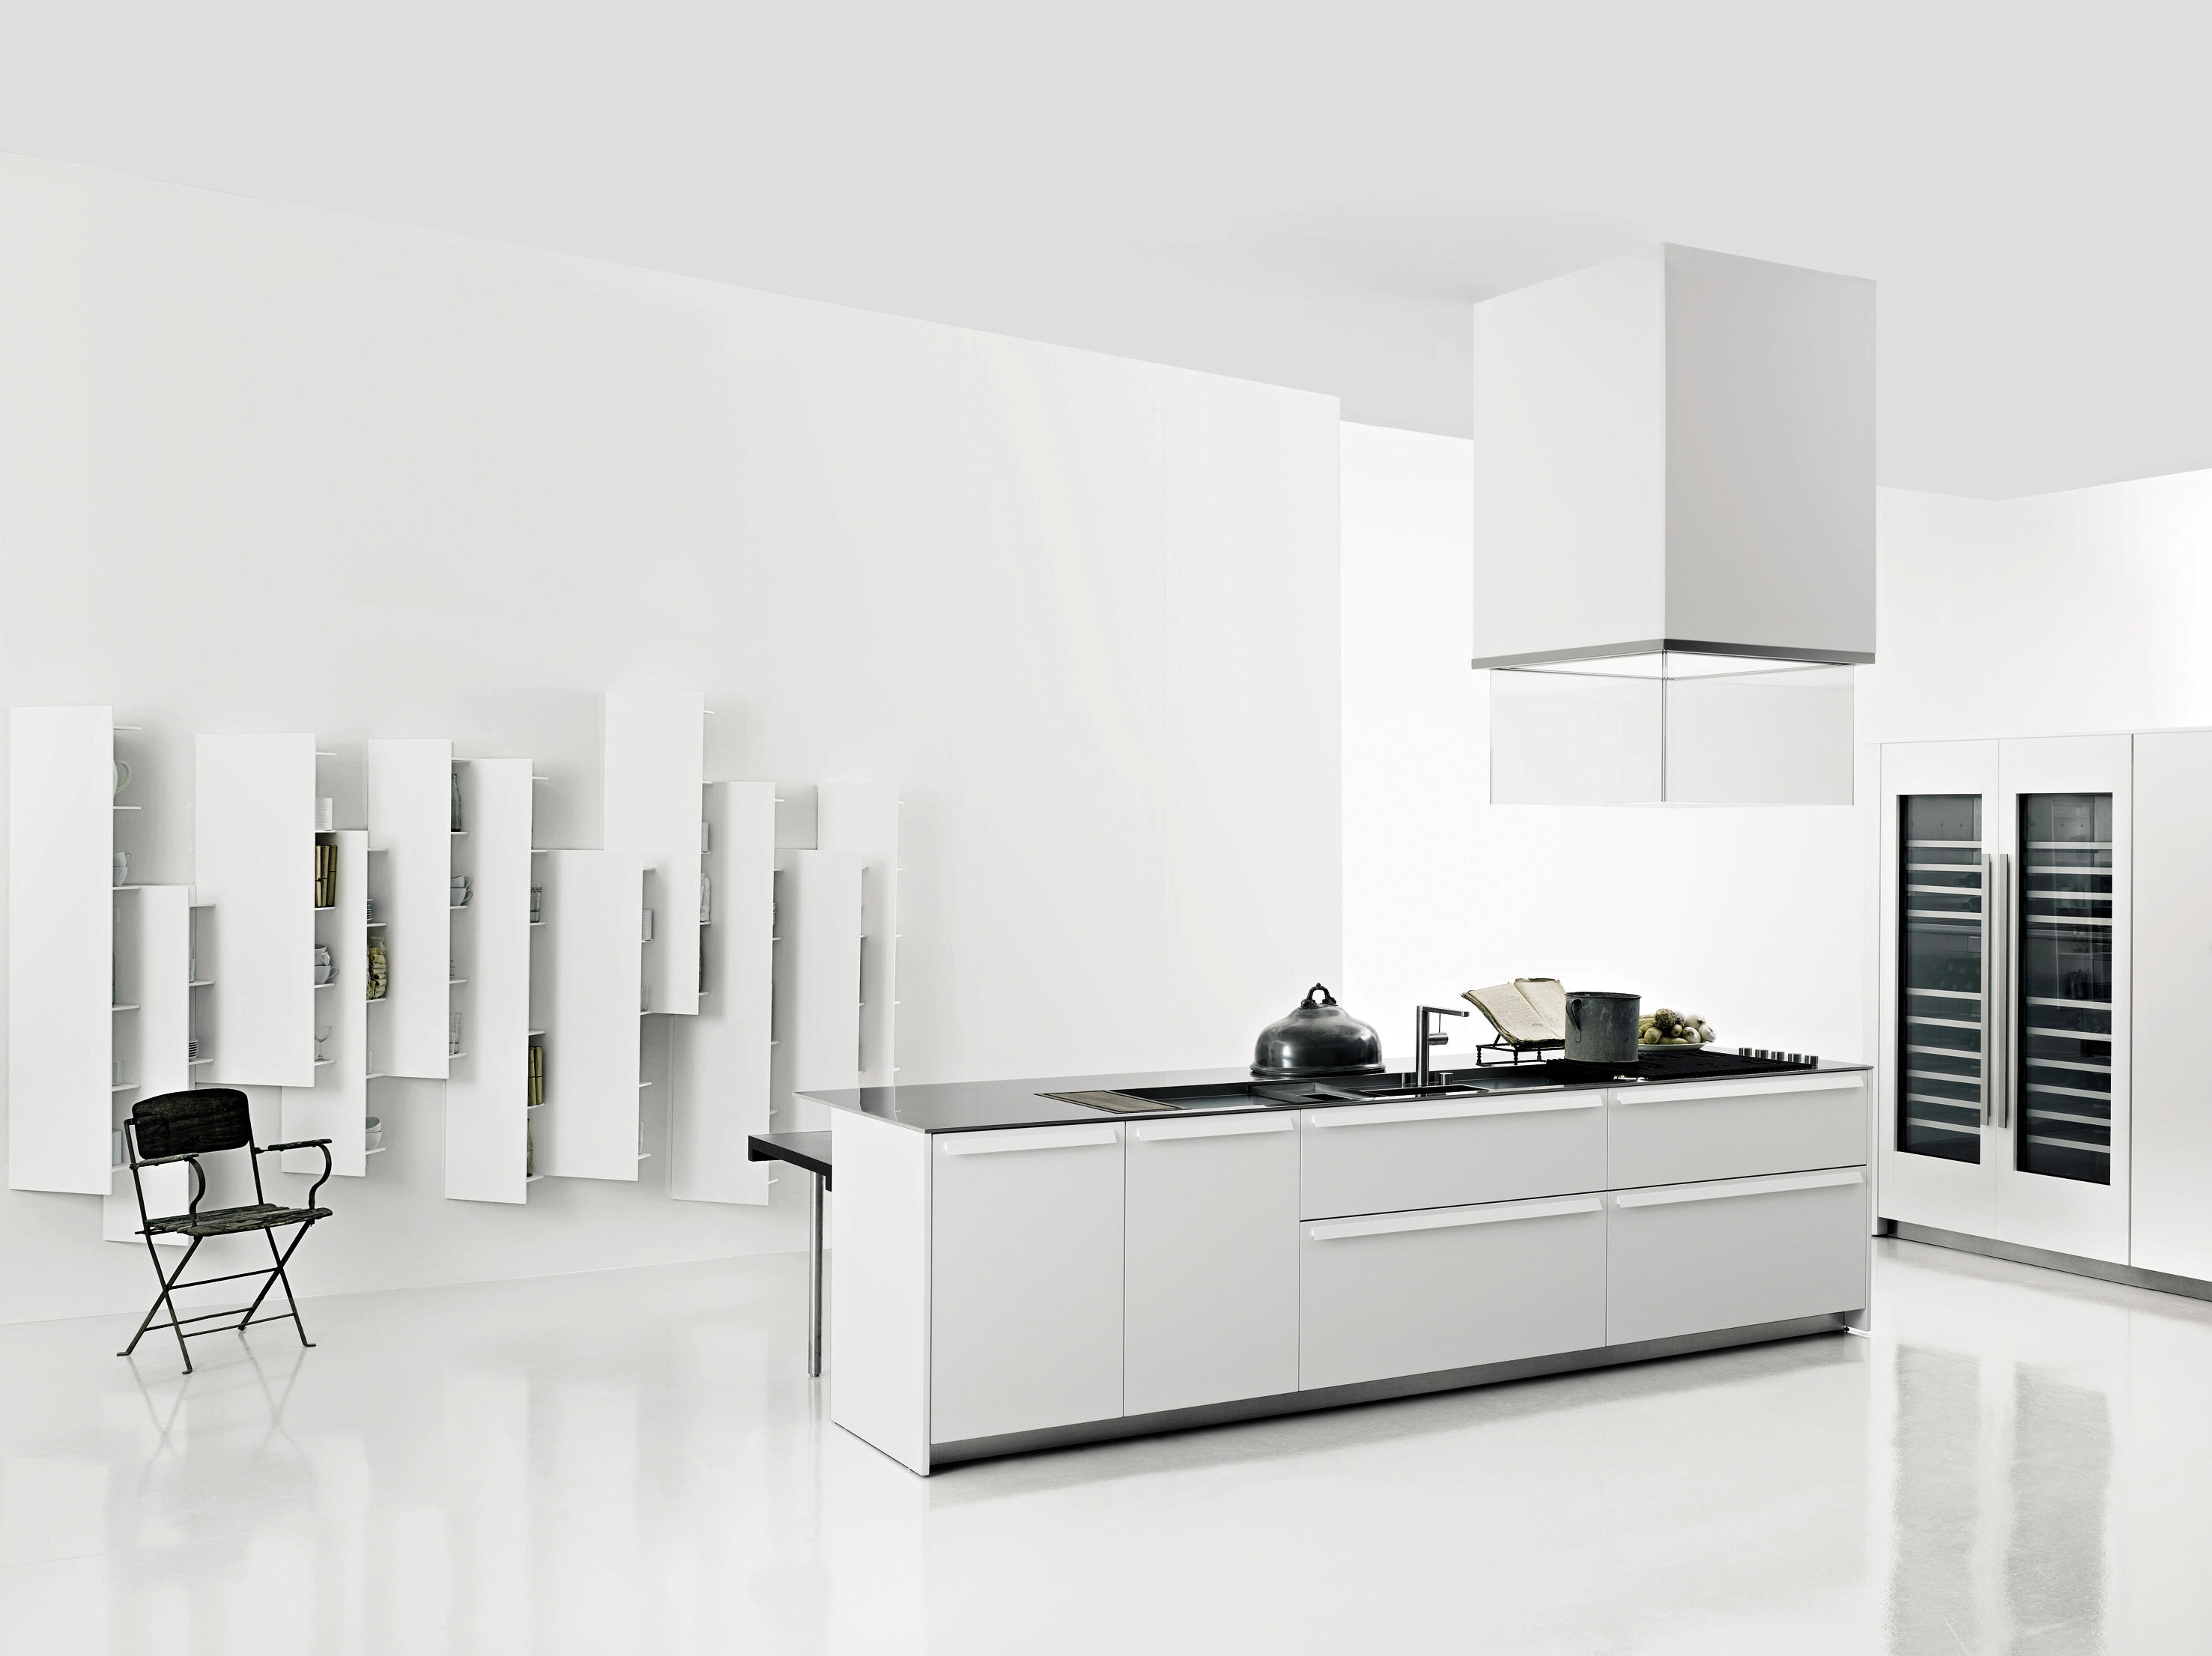 APRILE - Kücheninseln von Boffi | Architonic